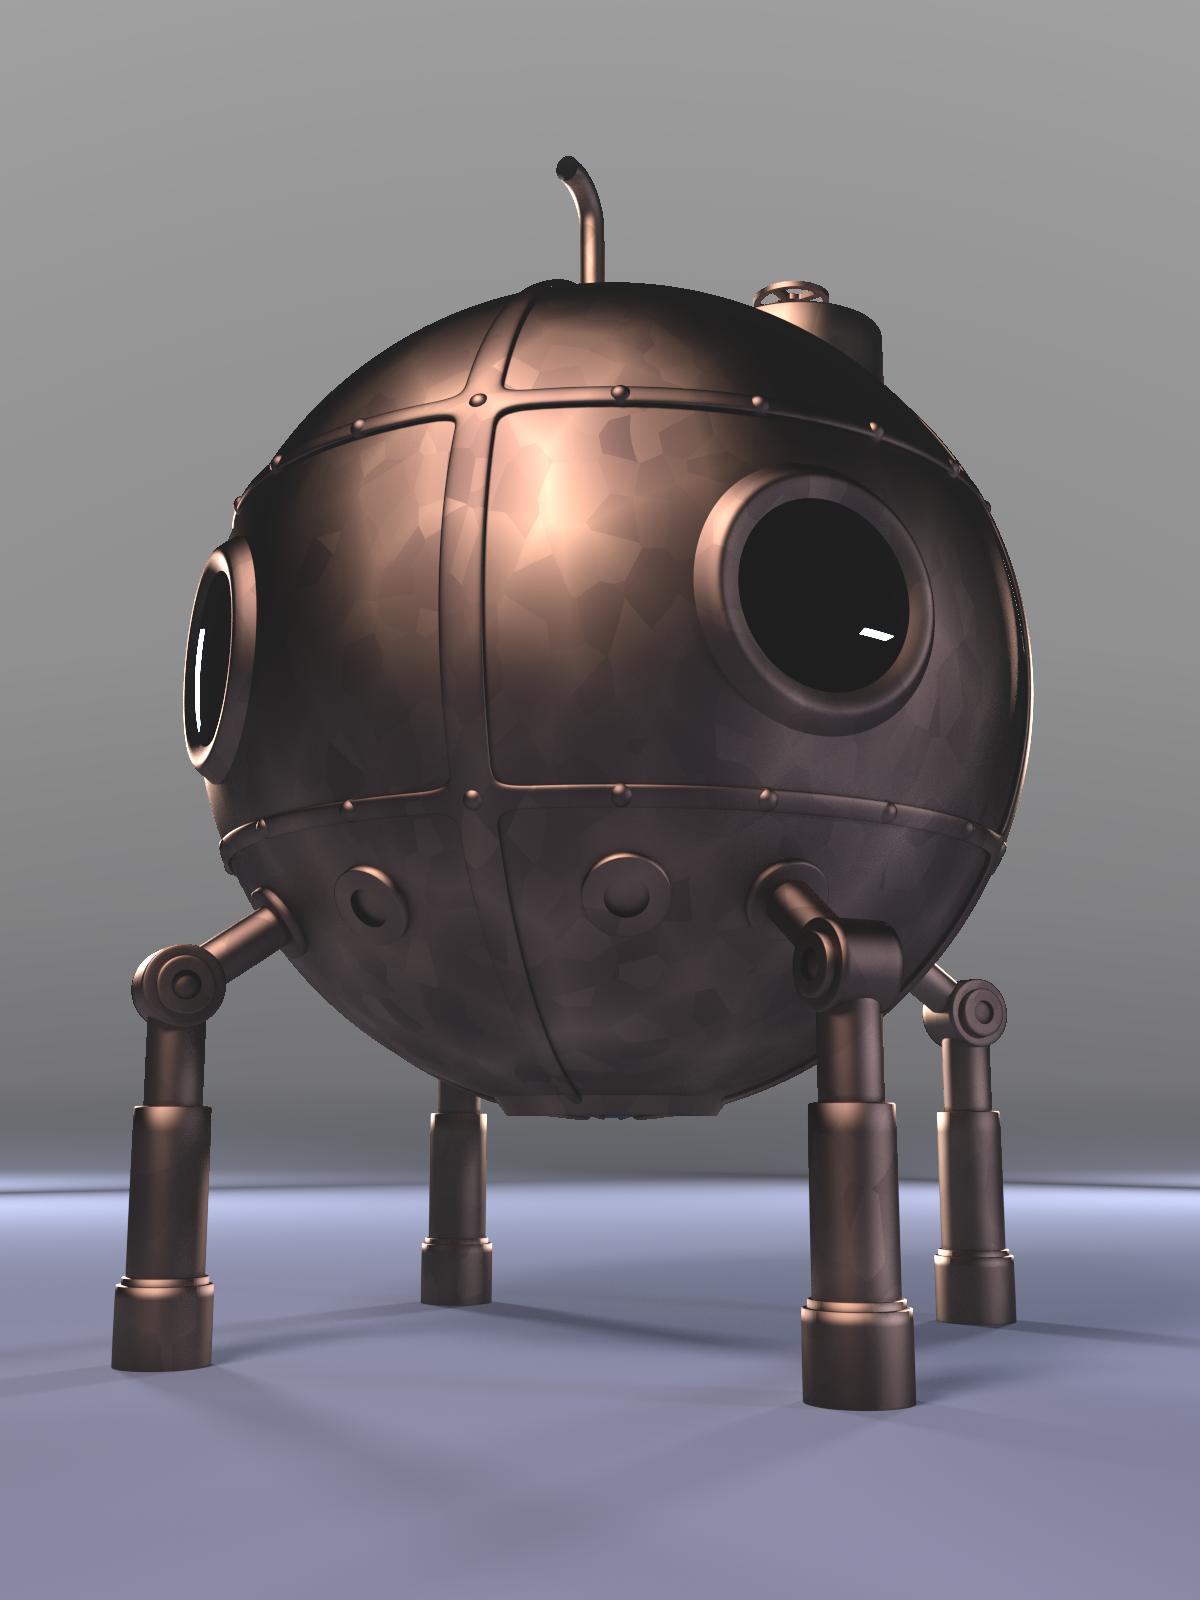 3d Model Steampunk Bathysphere By Ark4n On Deviantart